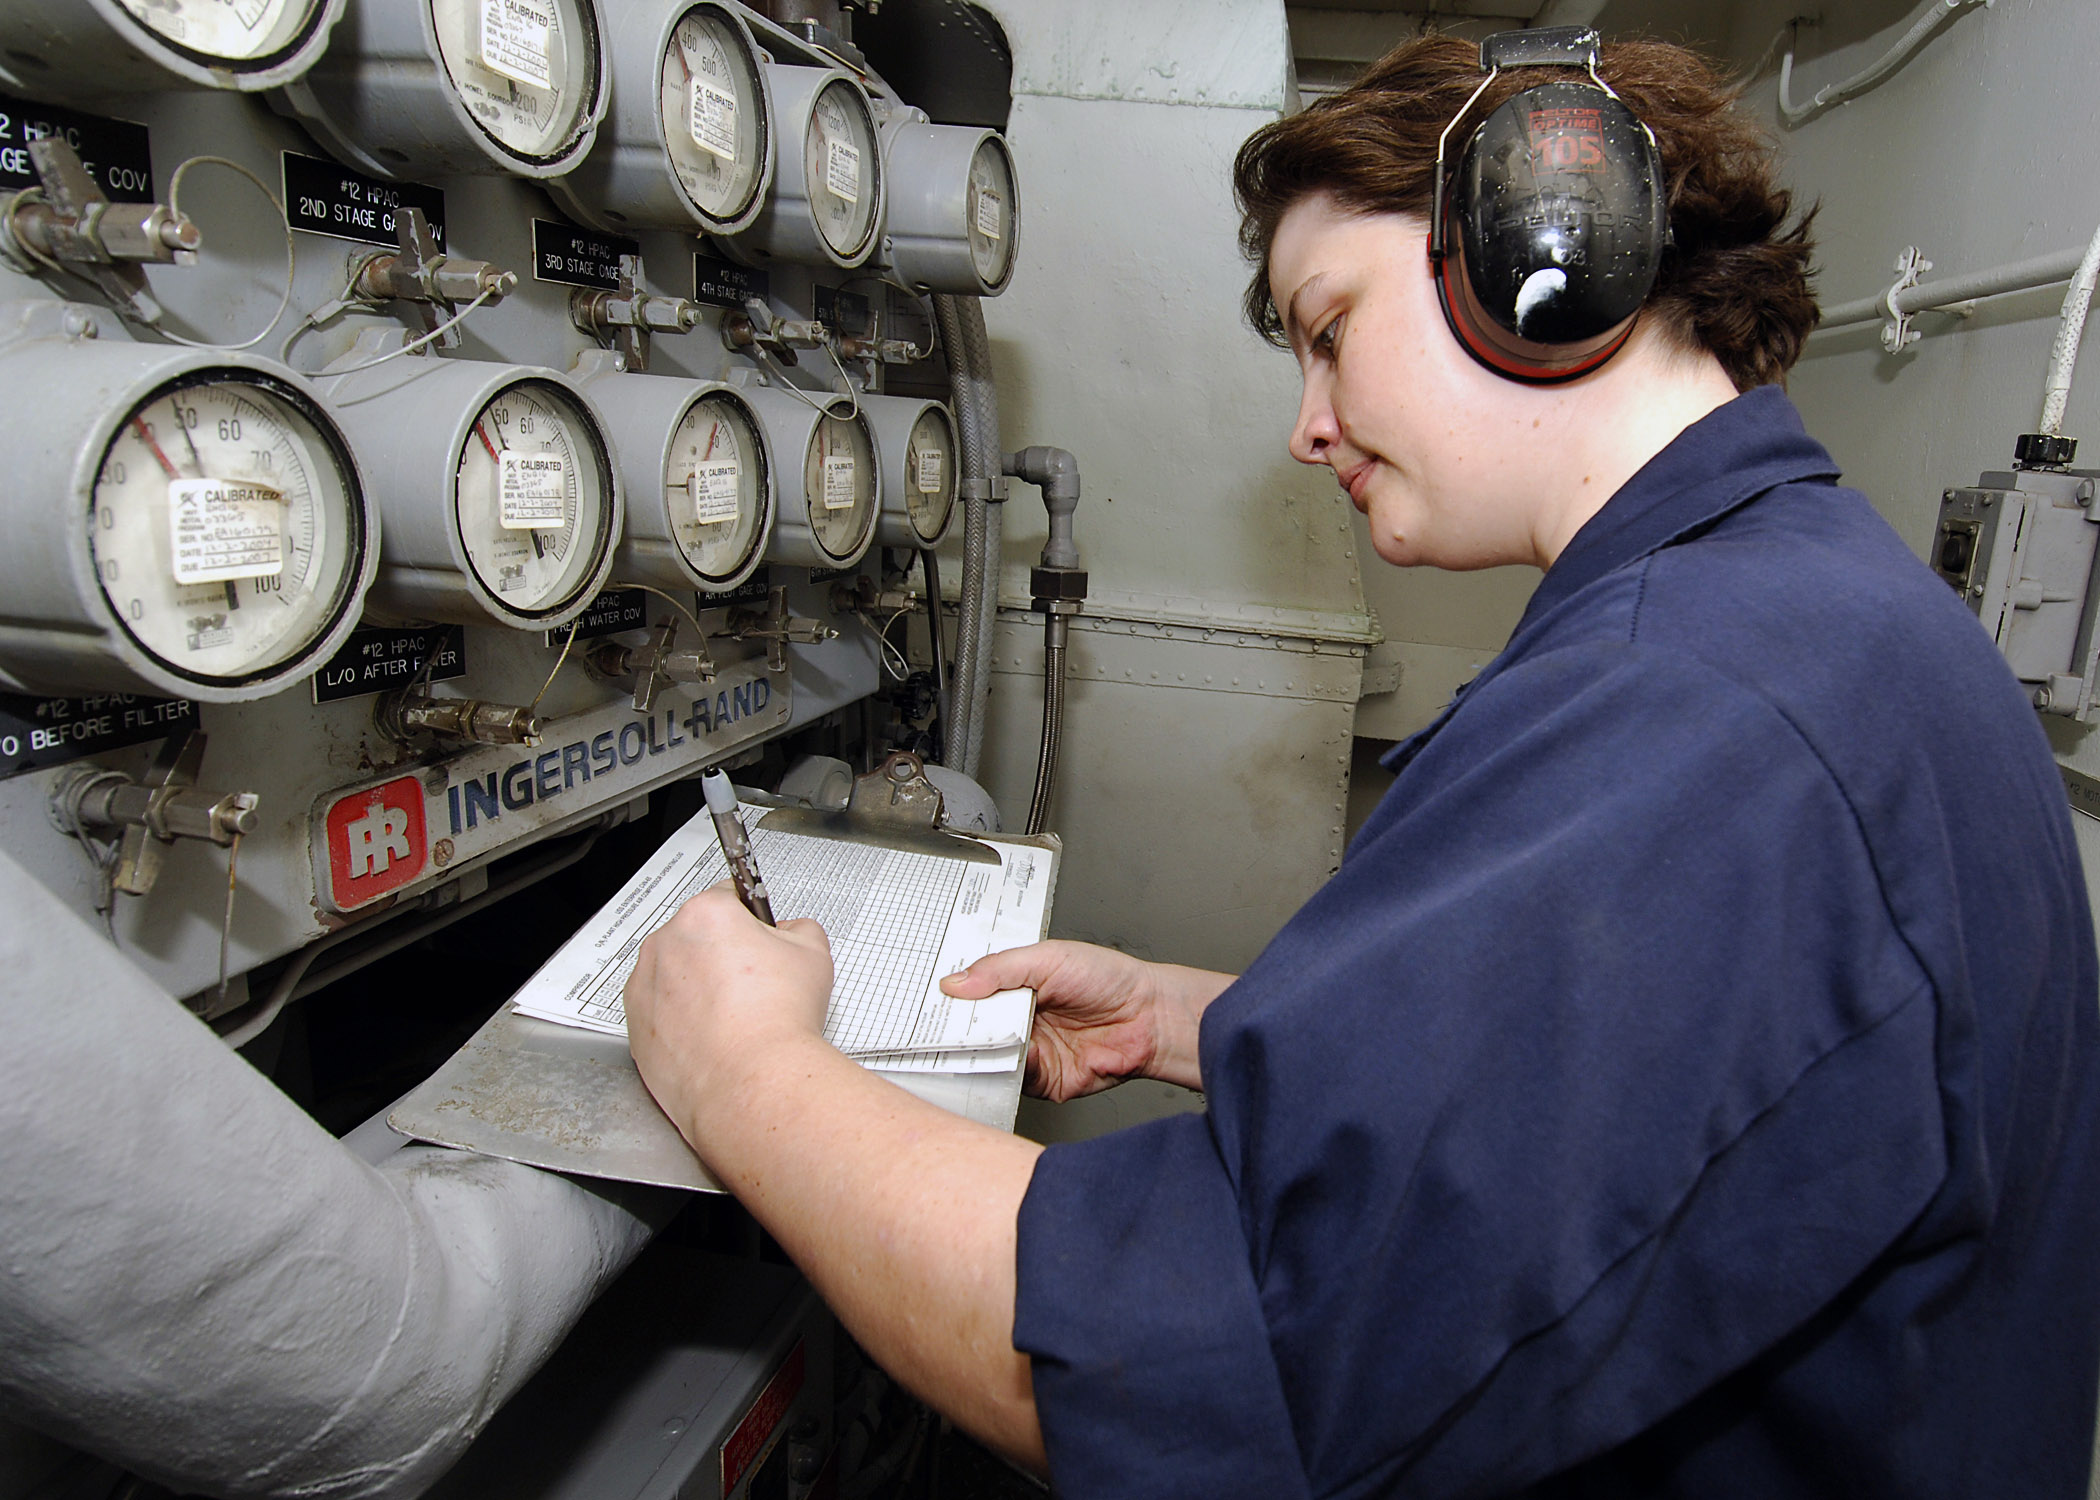 File:US Navy 071106-N-8132M-027 Machinist's Mate 1st Class Karin